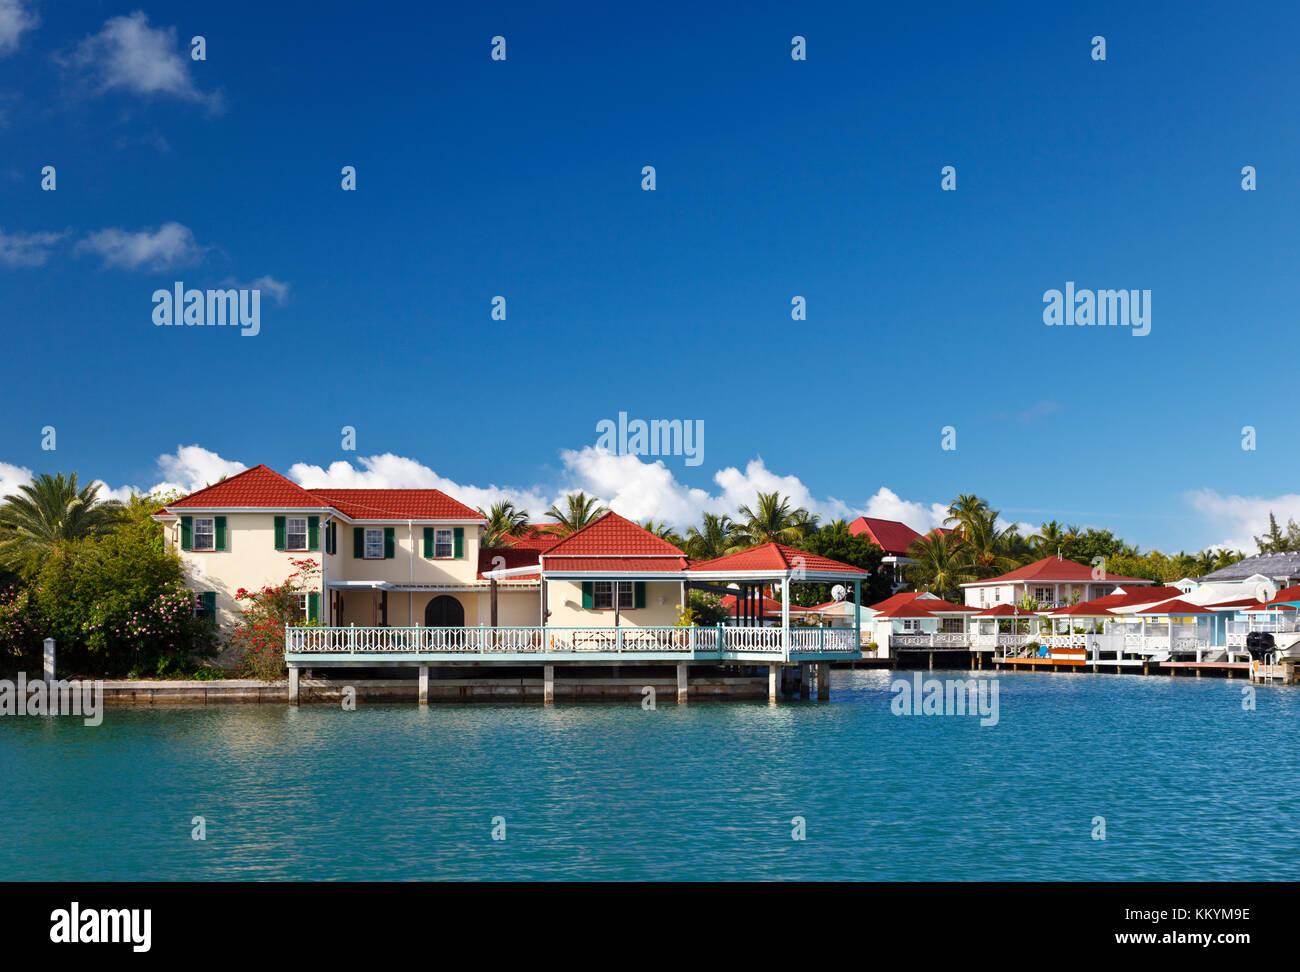 Seaside Villas near Jolly Harbour in Antigua. - Stock Image